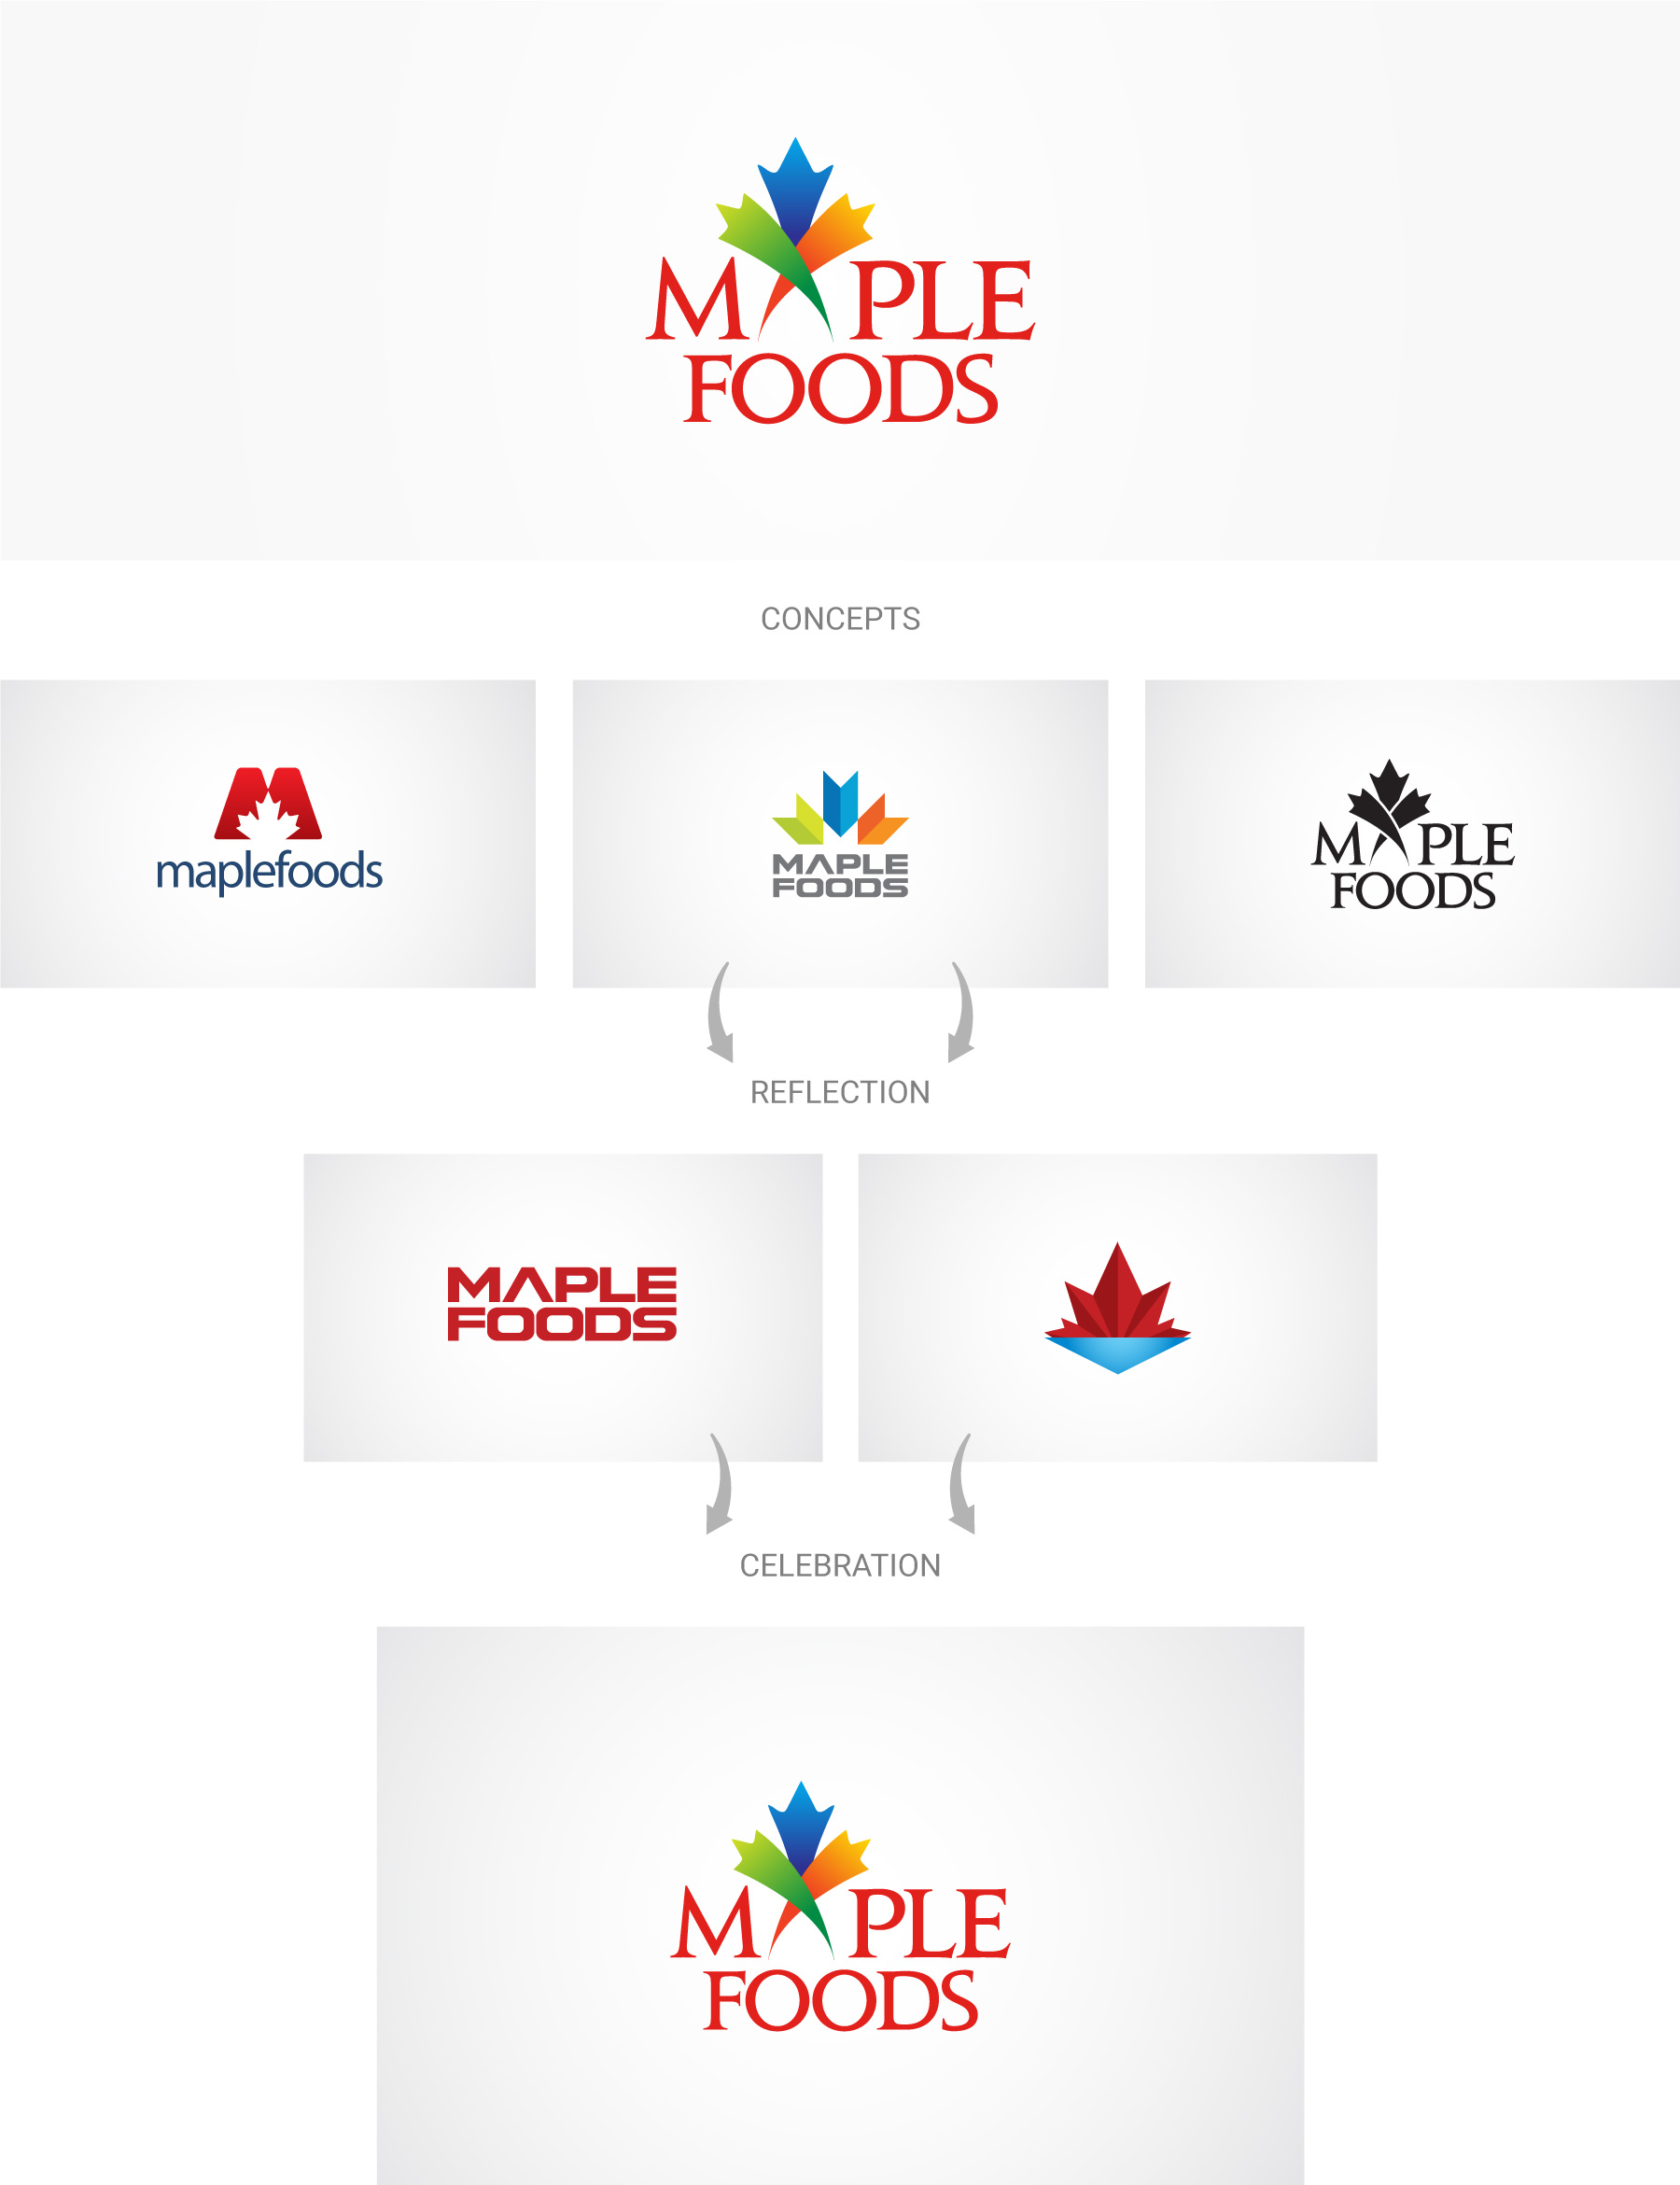 Maplefoods-logo-design